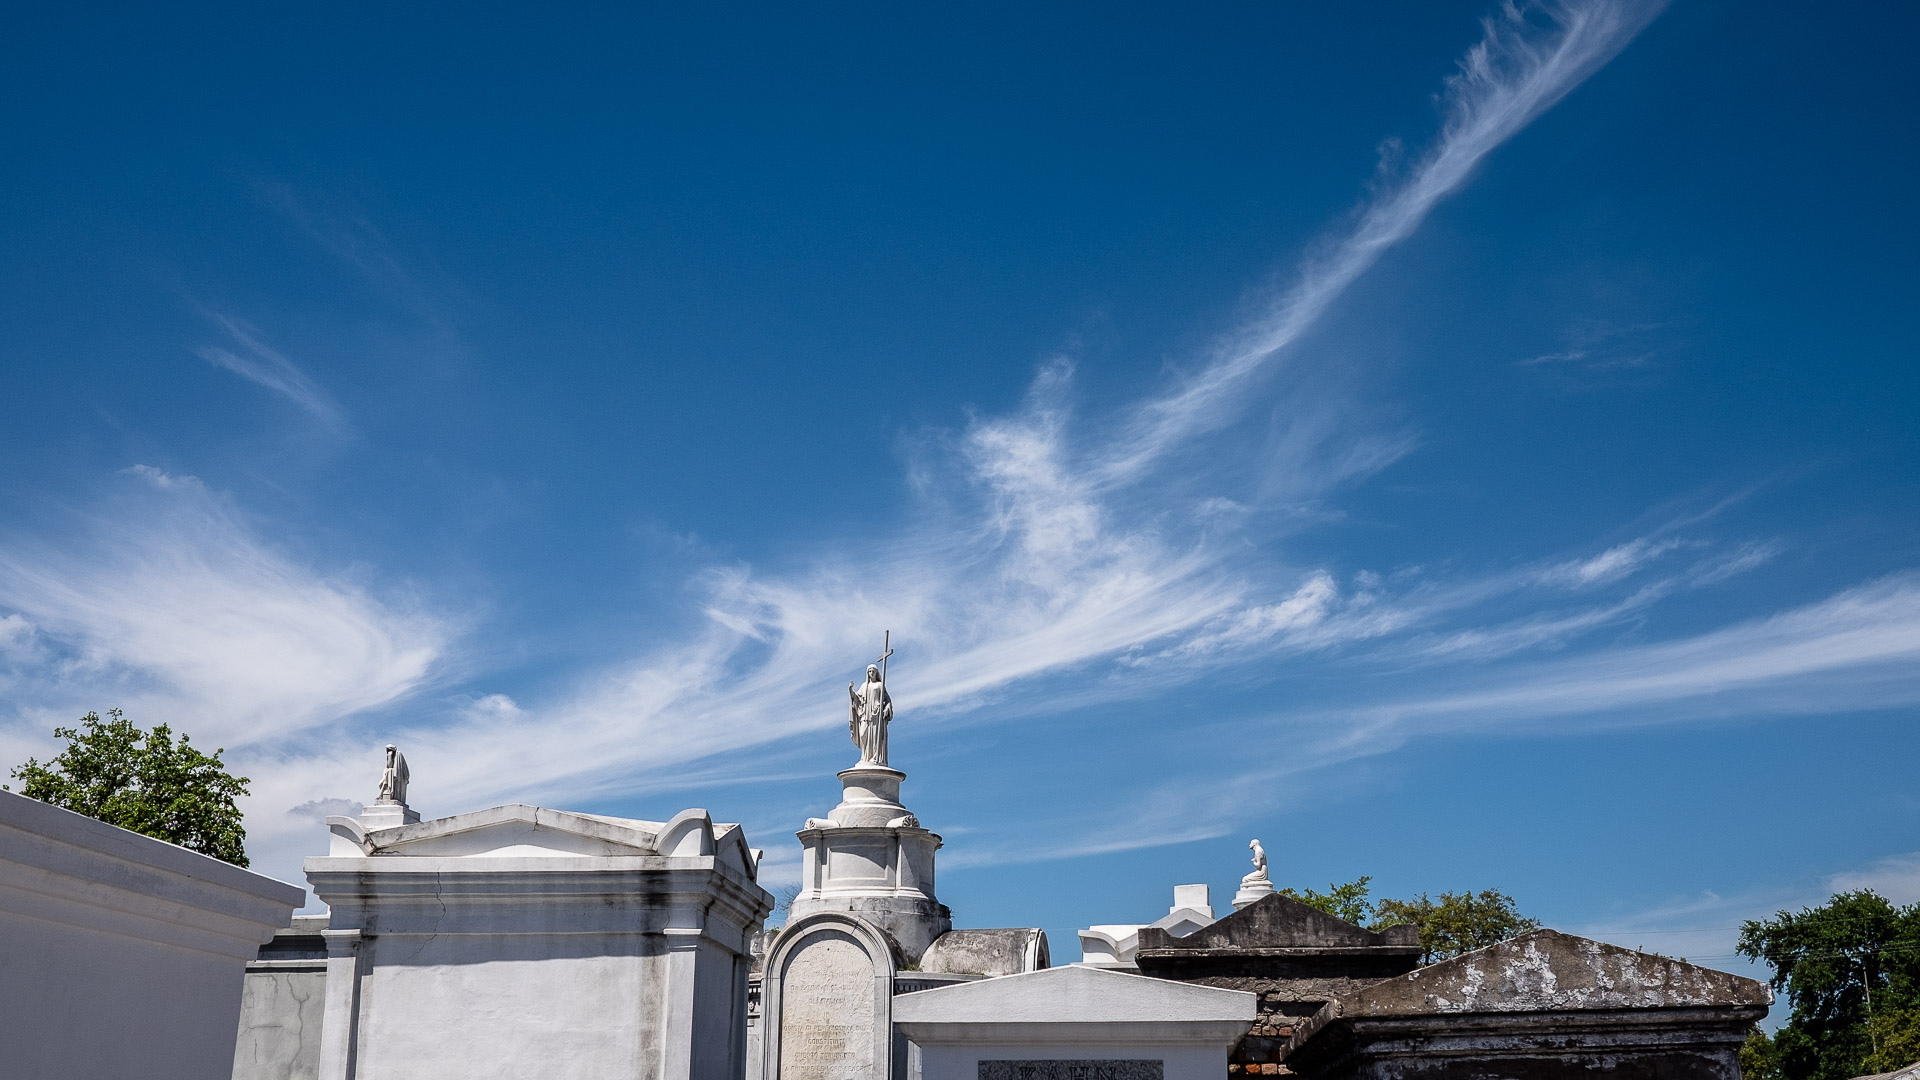 170402-New_Orleans-90-1080.jpg